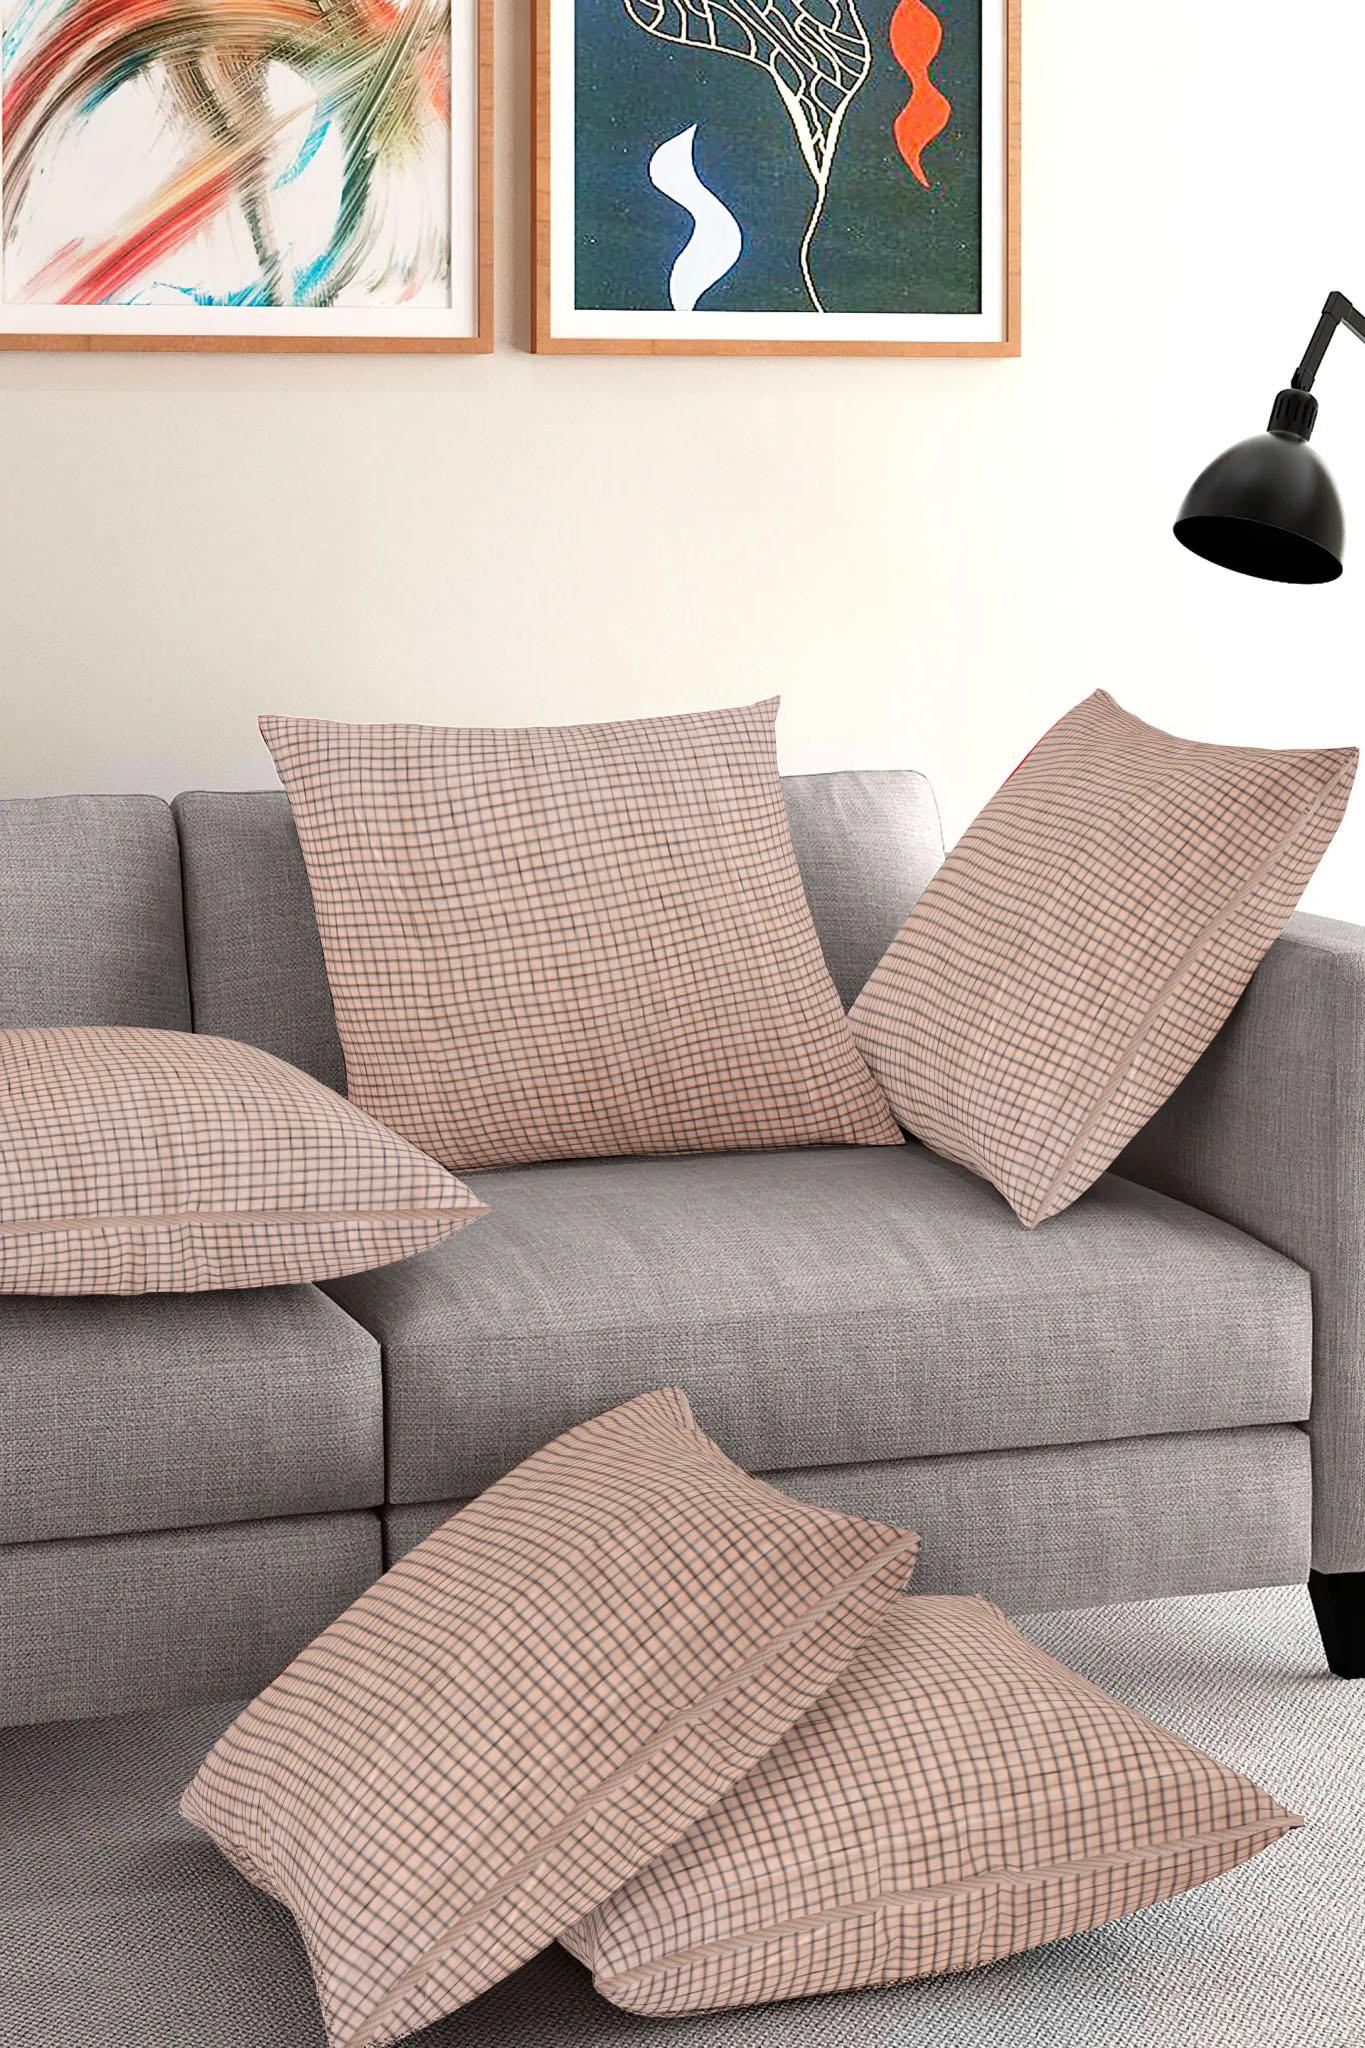 /home/customer/www/fabartcraft.com/public_html/uploadshttps://www.shopolics.com/uploads/images/medium/Beige-Black-Cotton-Cushion-Cover-35415.jpg